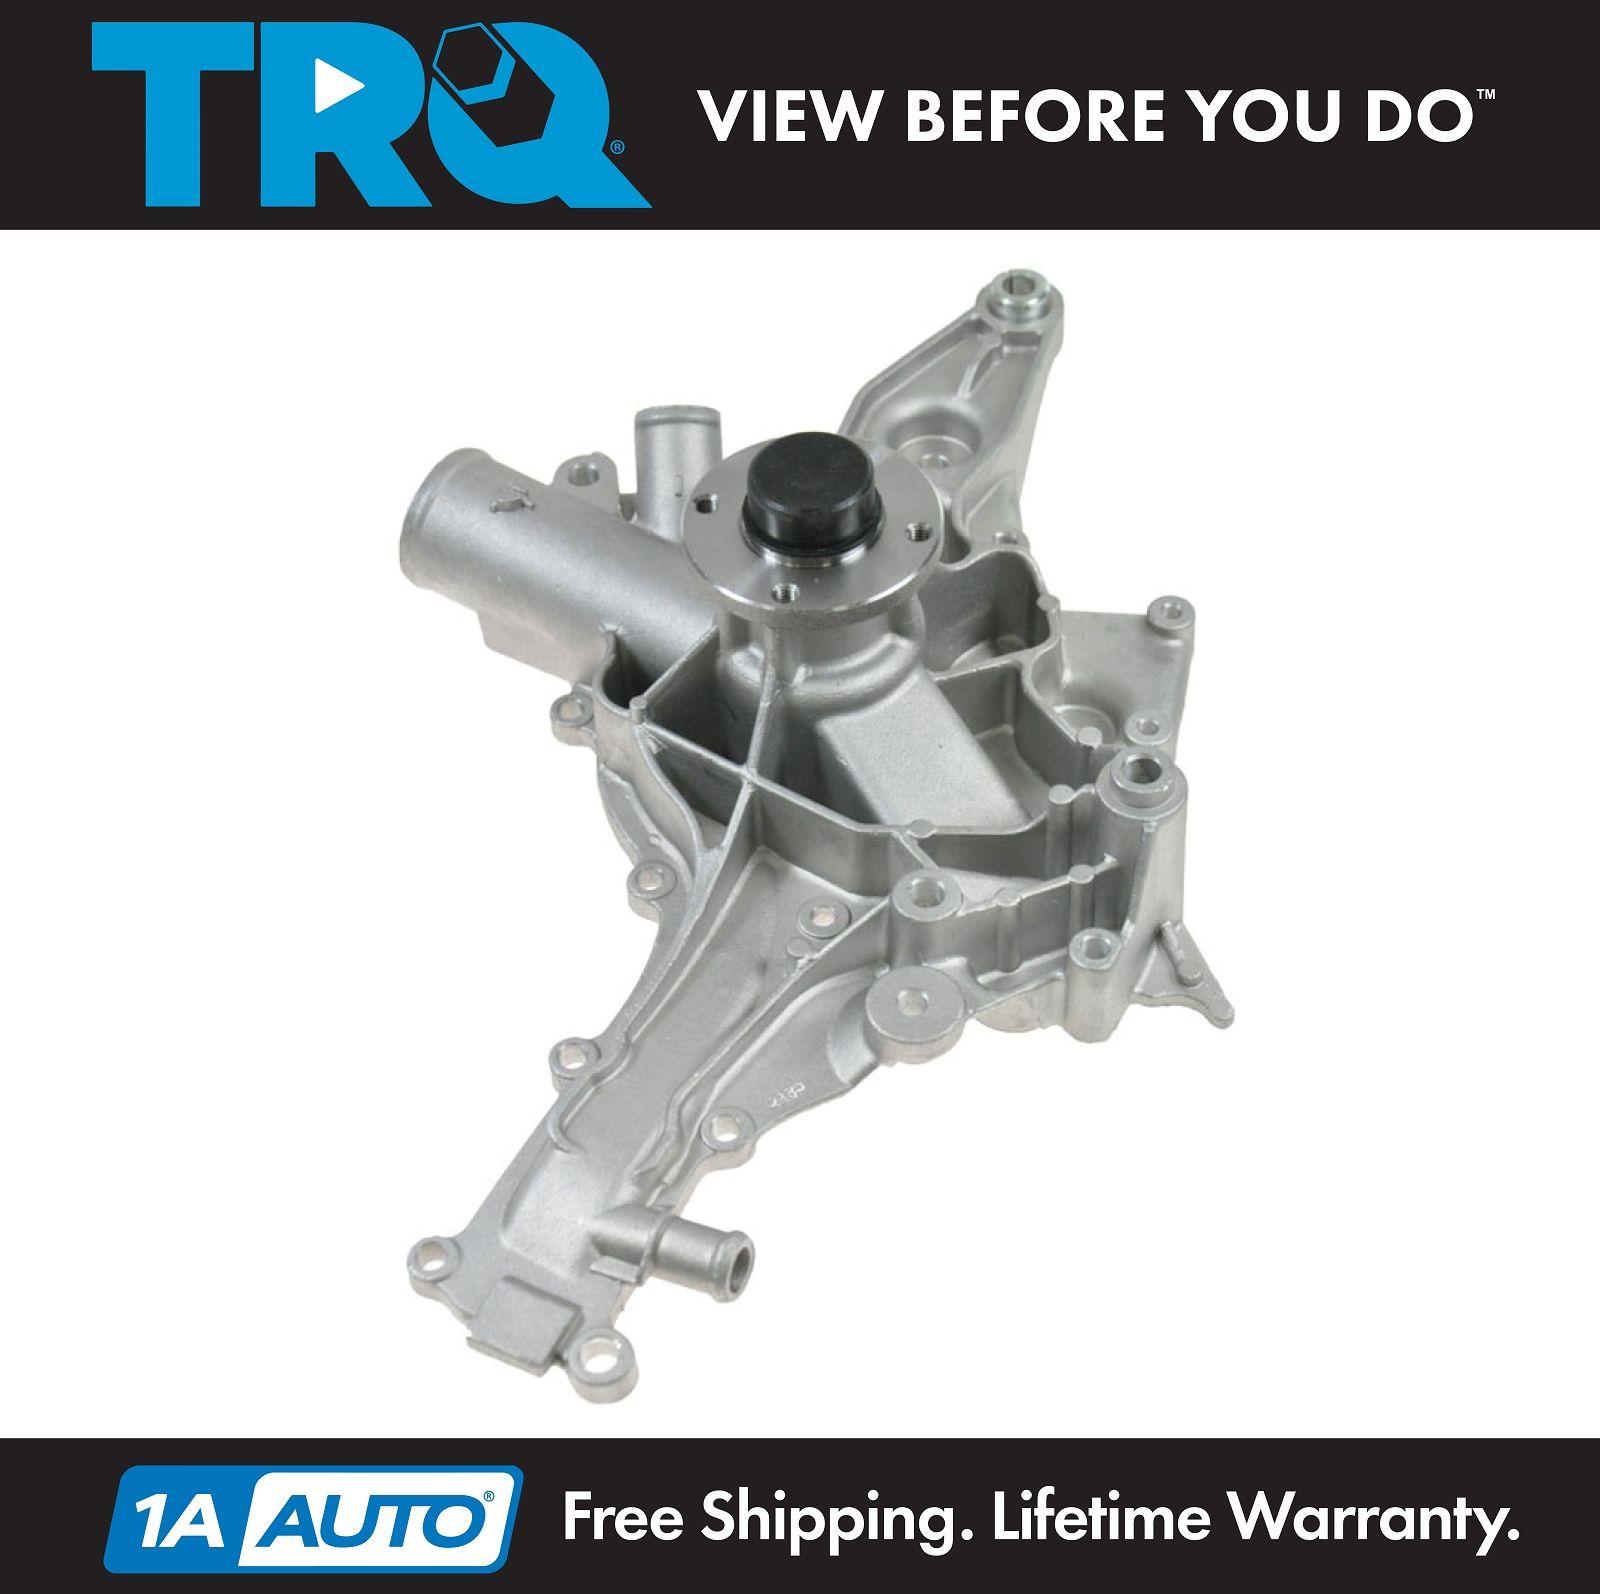 Mercedes C//CLK//E//ML//S//SL//SLK Water Pump inc Gasket